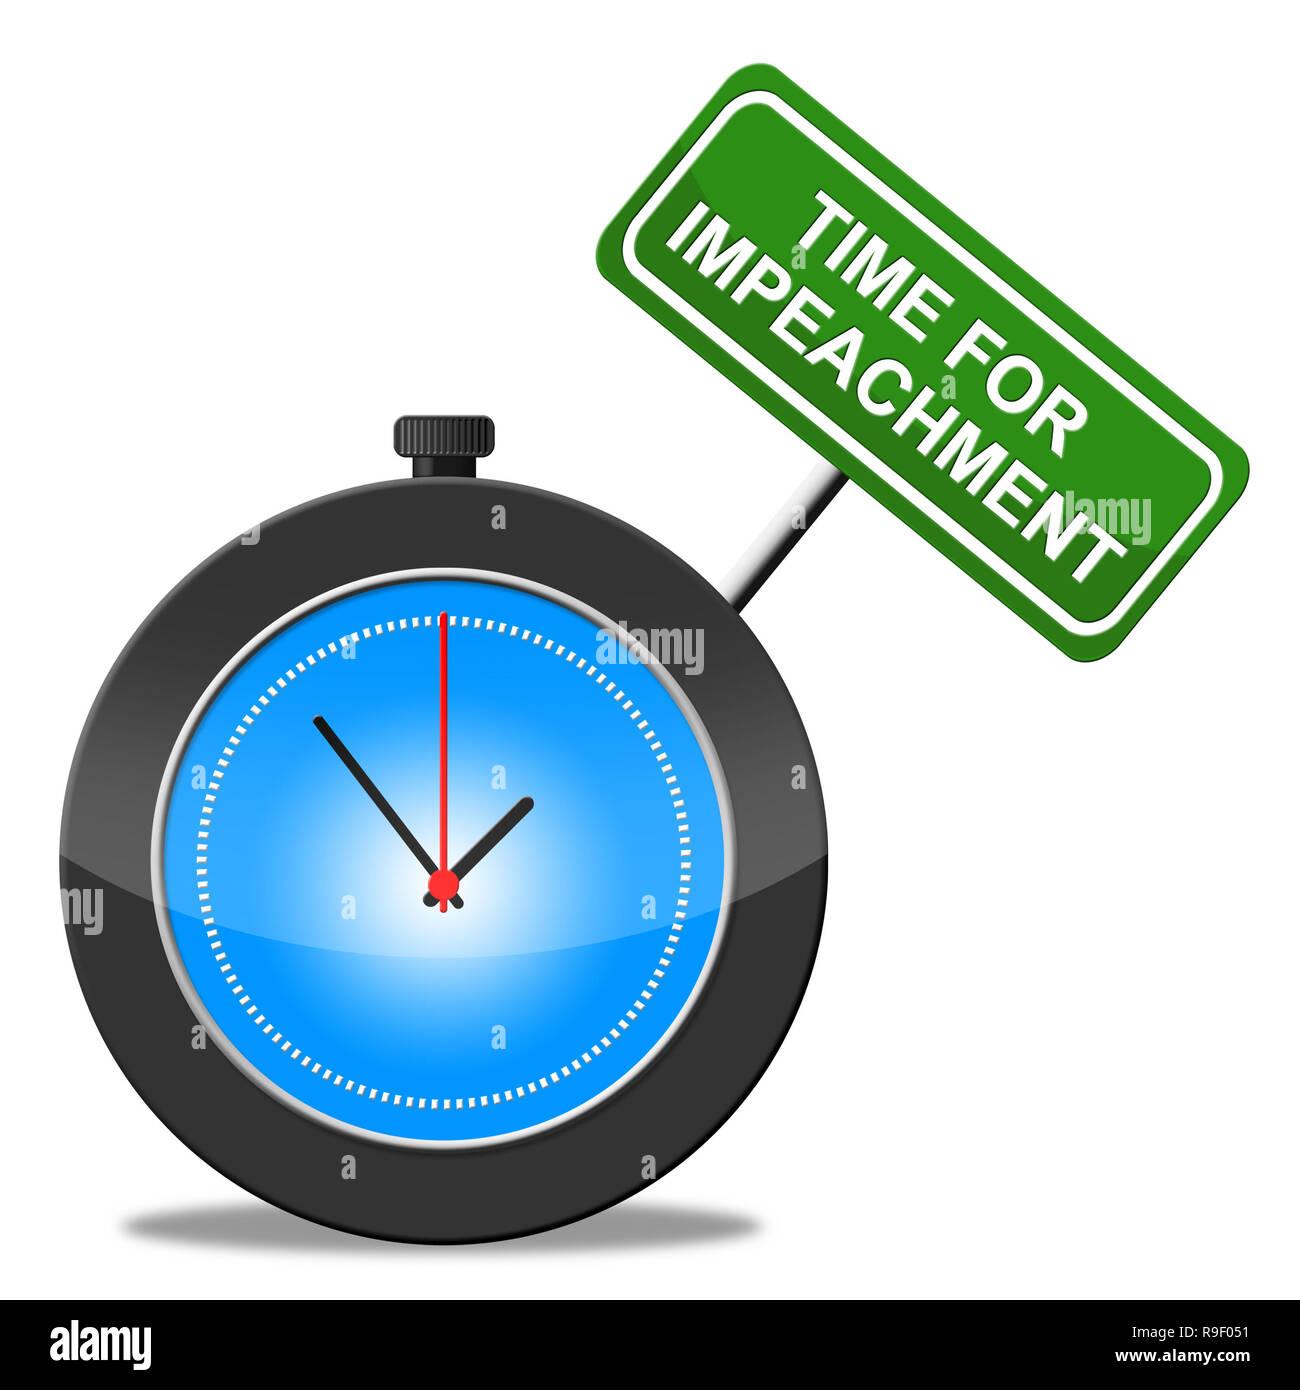 Impeachment Time To Remove Corrupt President Or Politician. Legal Indictment In Politics. Stock Photo